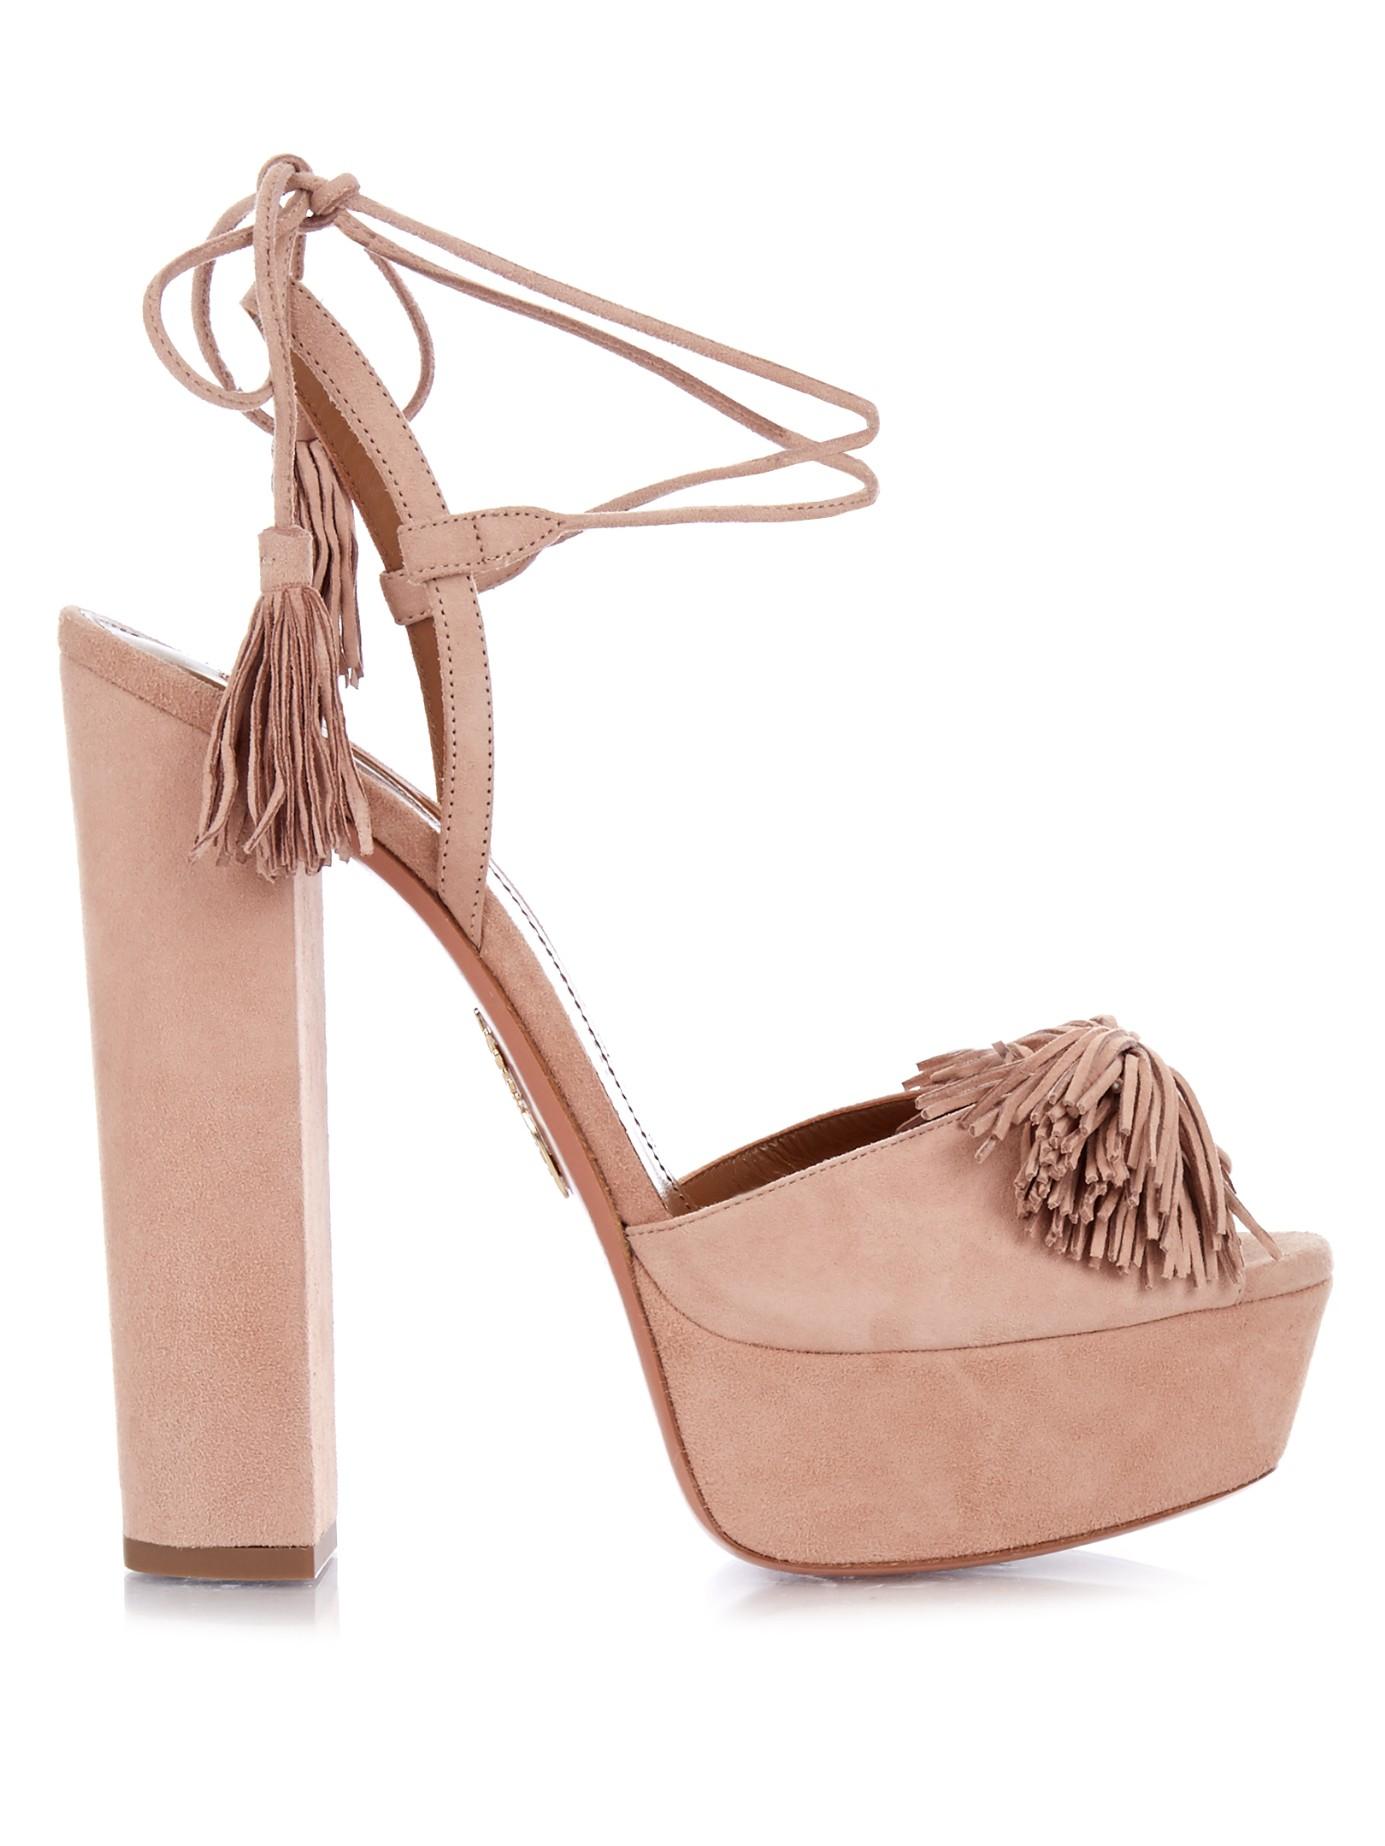 33377b69423 Lyst - Aquazzura Wild One Suede Sandals in Pink